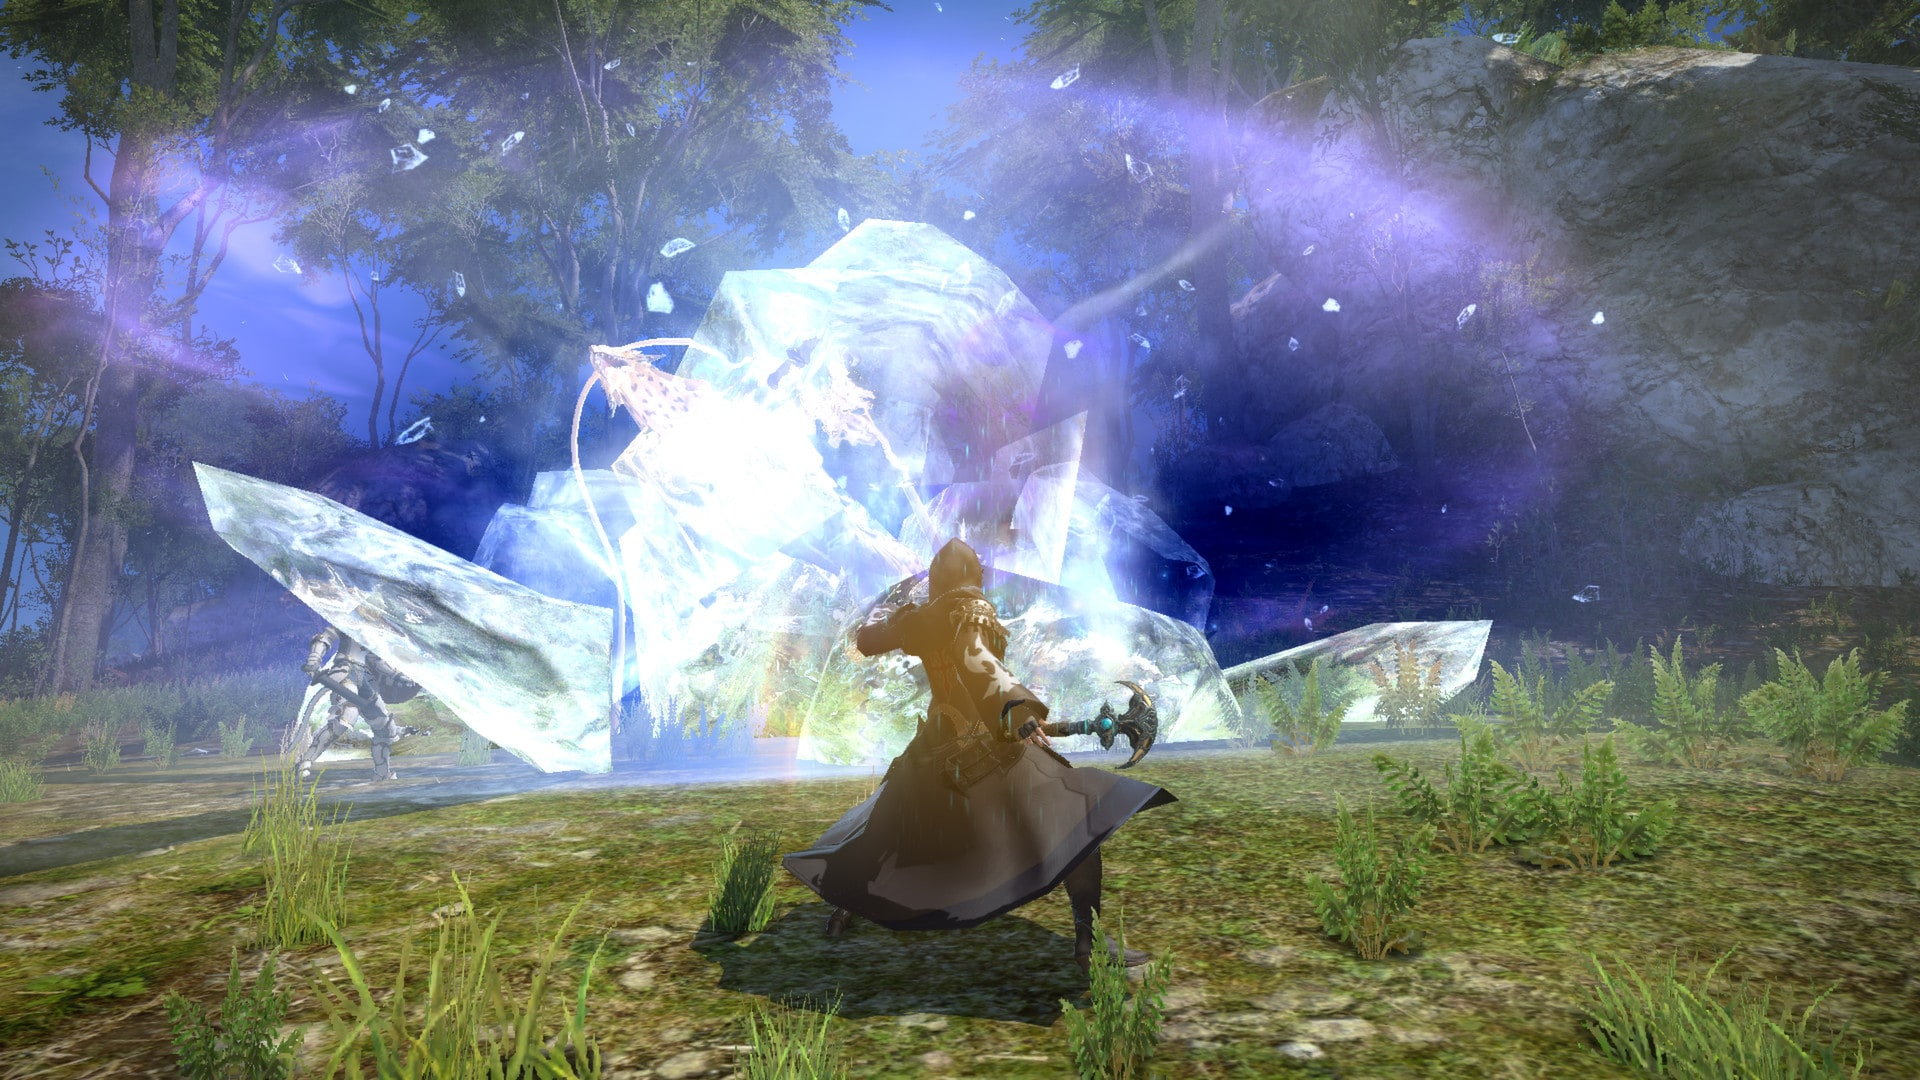 FINAL FANTASY XIV ONLINE COMPLETE EDITION Final Fantasy Key EUROPE - 3